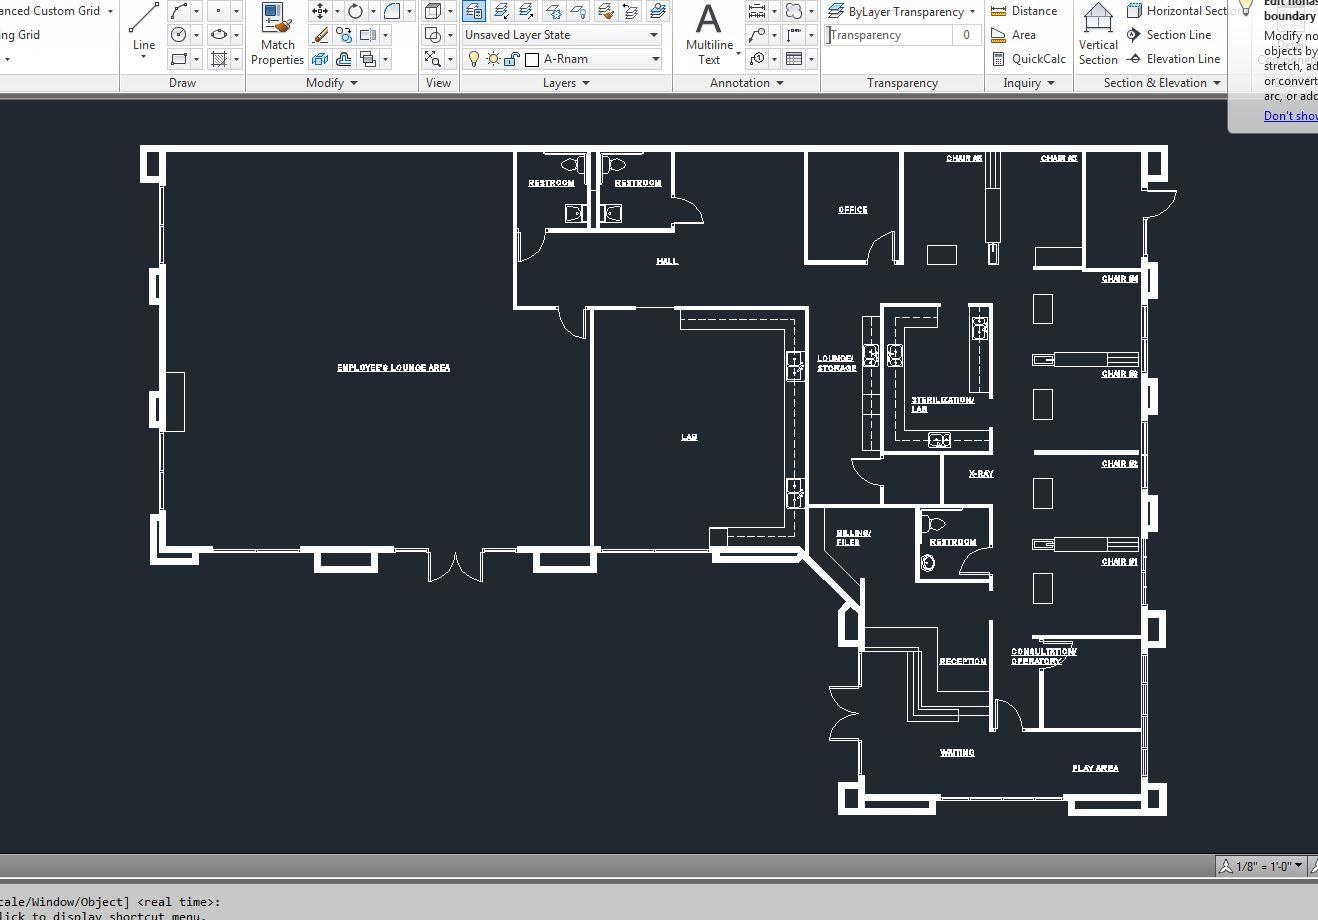 Dentist Building Floor Plan AutoCAD